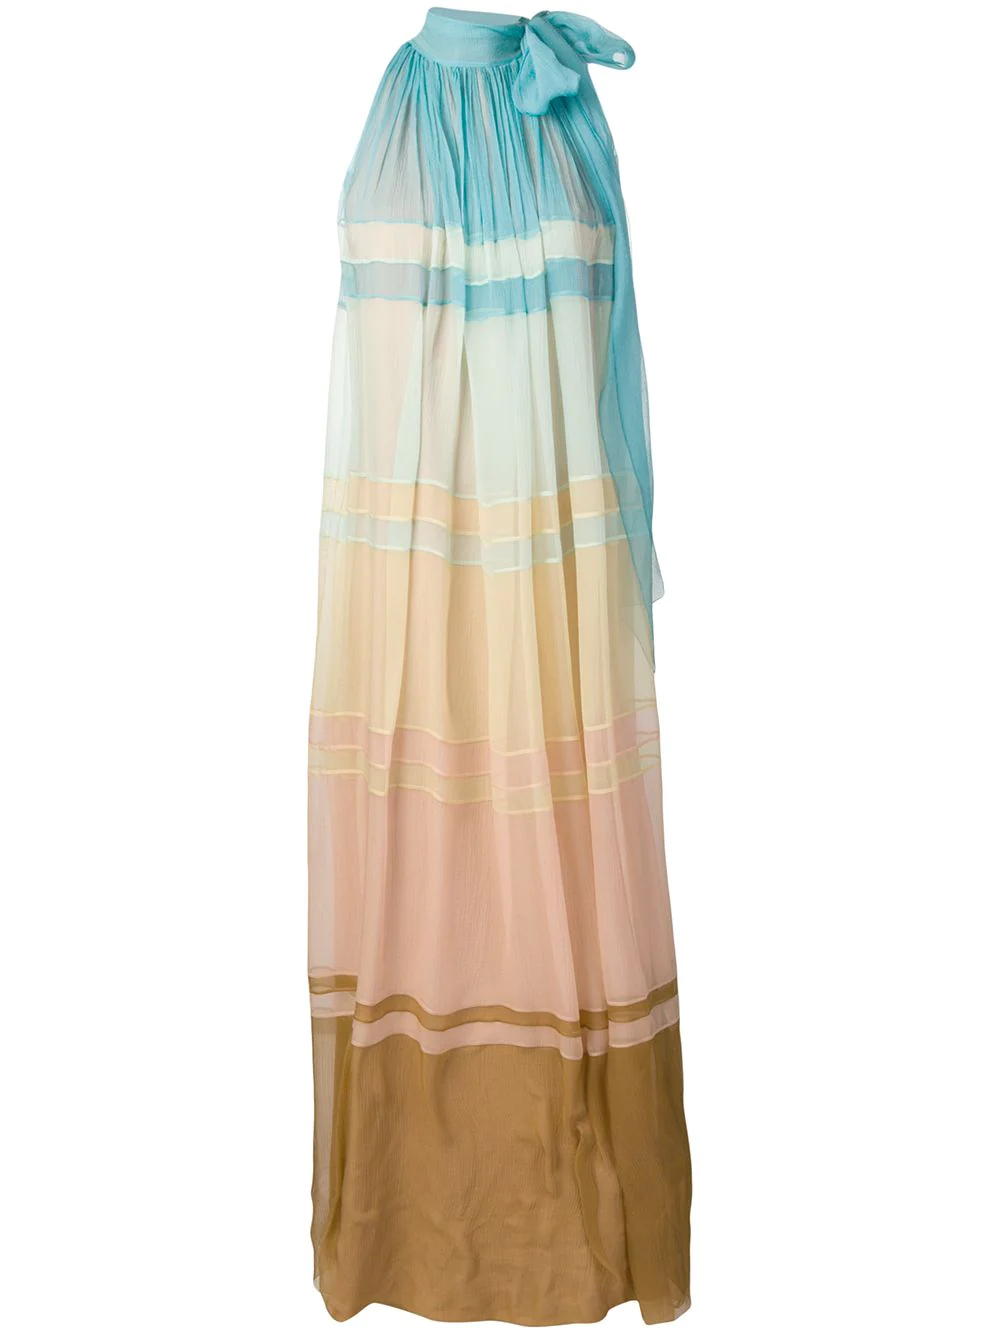 Alberta Ferretti | платье макси с эффектом градиент | Clouty